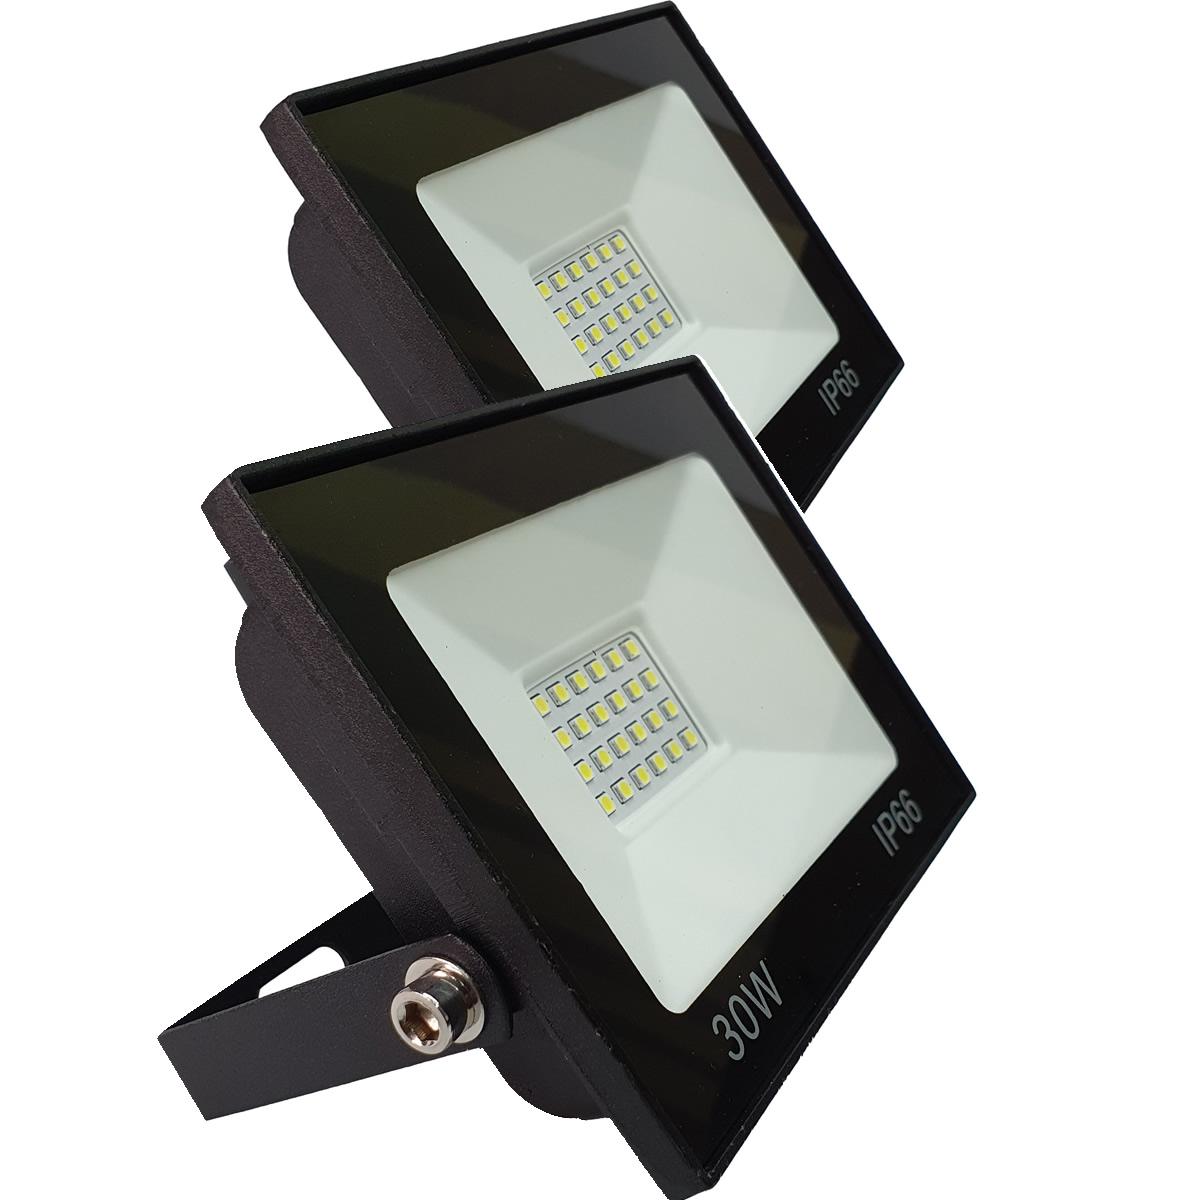 Kit 2 Refletor Led 20w Luz Verde E 2 Luminarias Emergencia